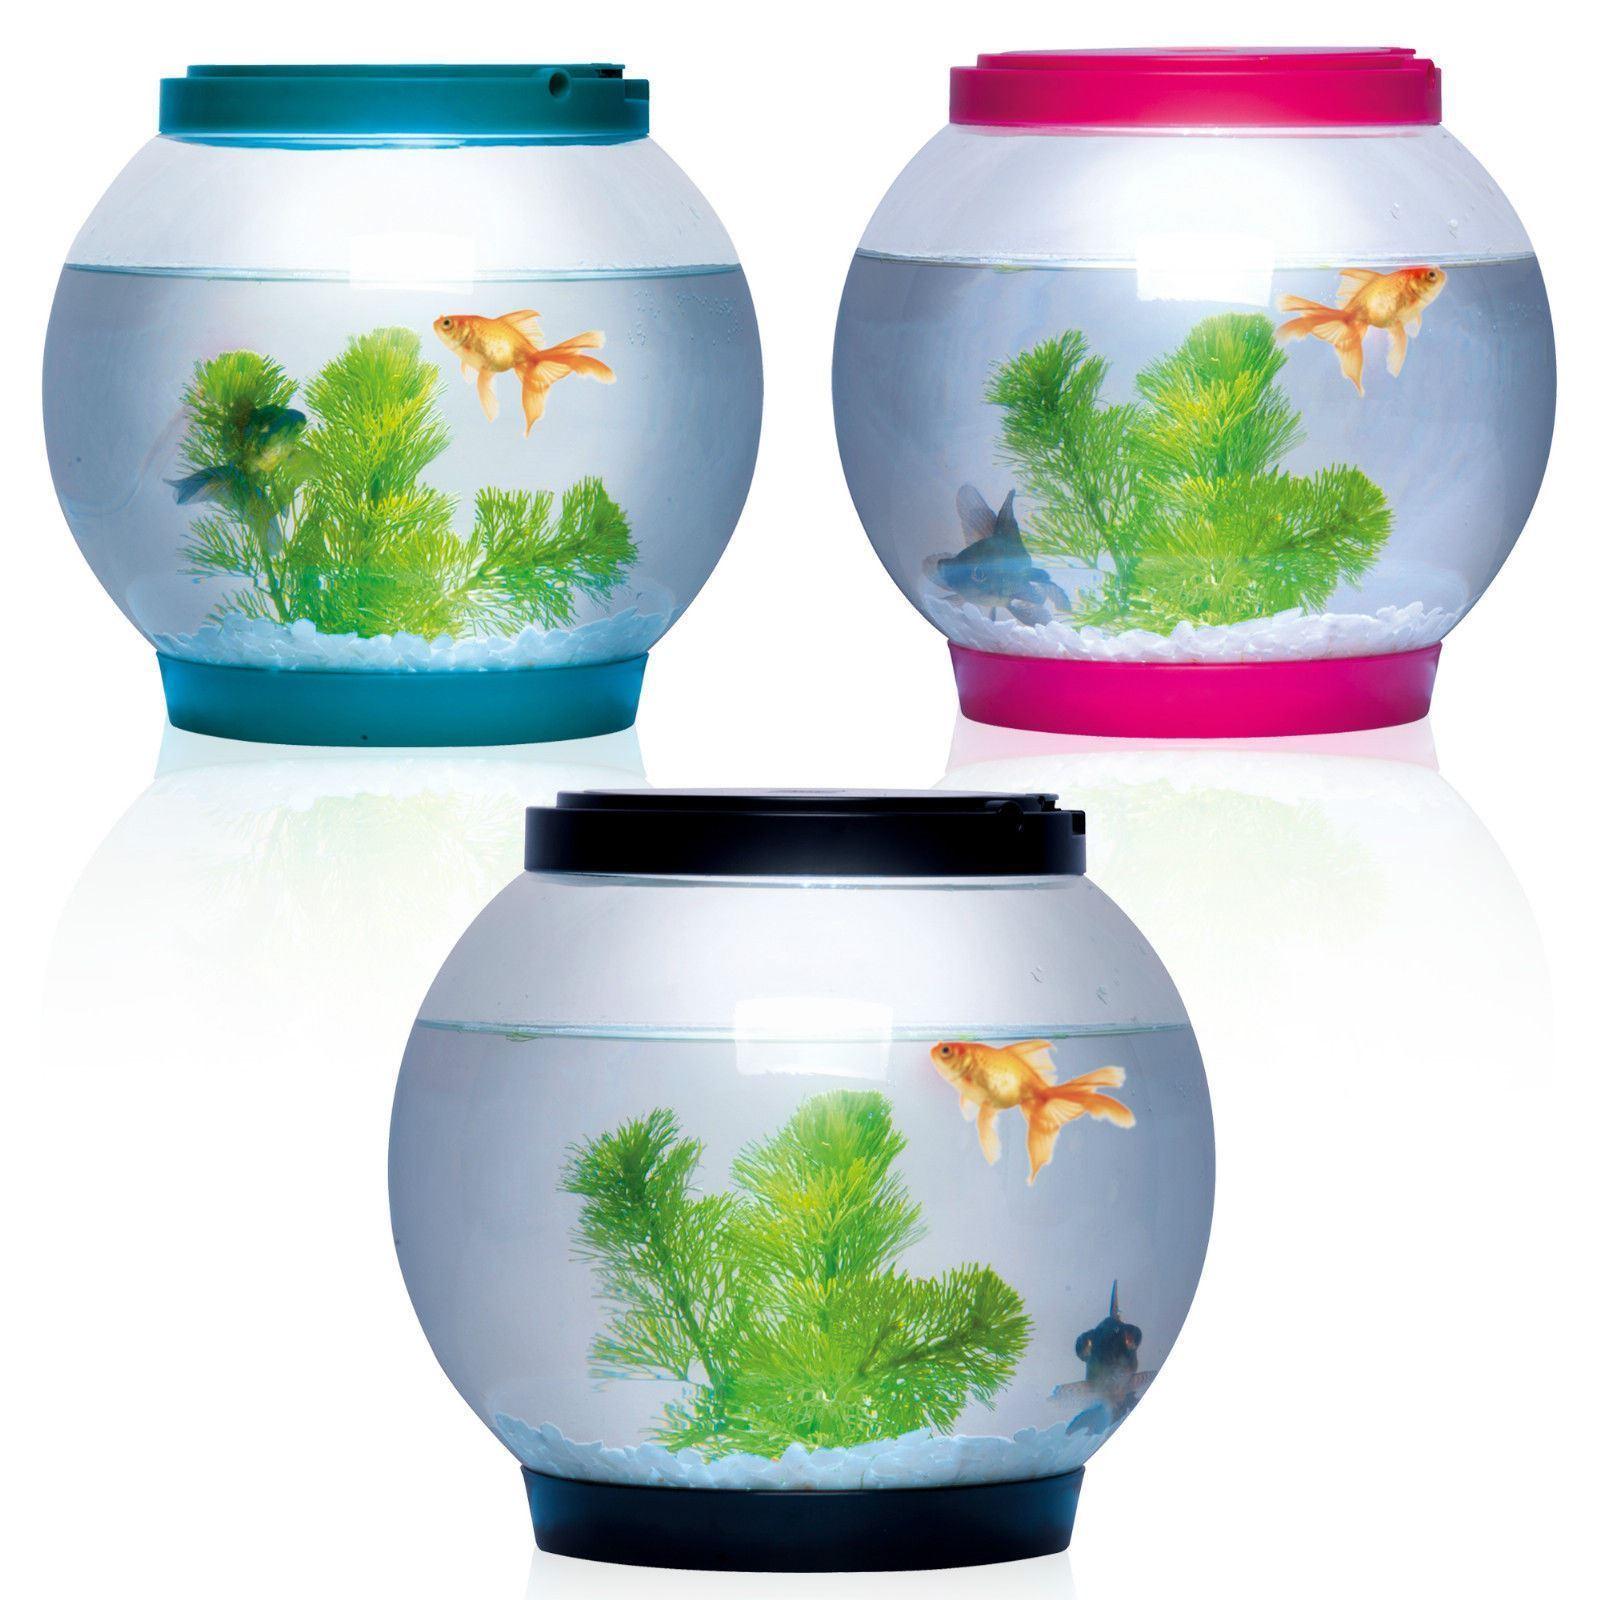 Fish aquarium in bangladesh - 5 Litre Glass Fish Tank Bowl Aquarium Water Home Office Desktop Goldfish Betta